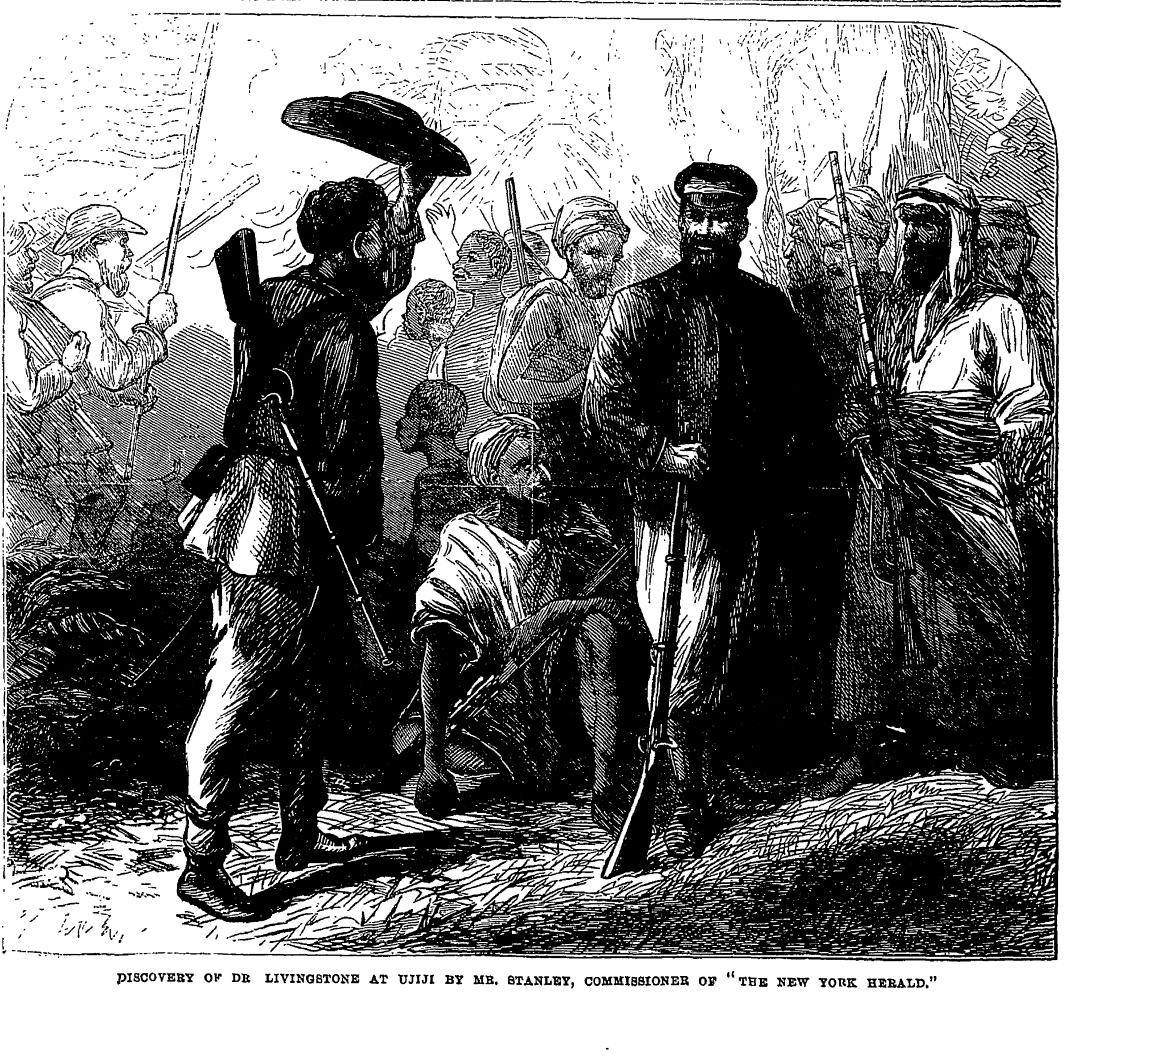 november 10 1871 dr livingstone i presume - Dr Livingstone I Presume